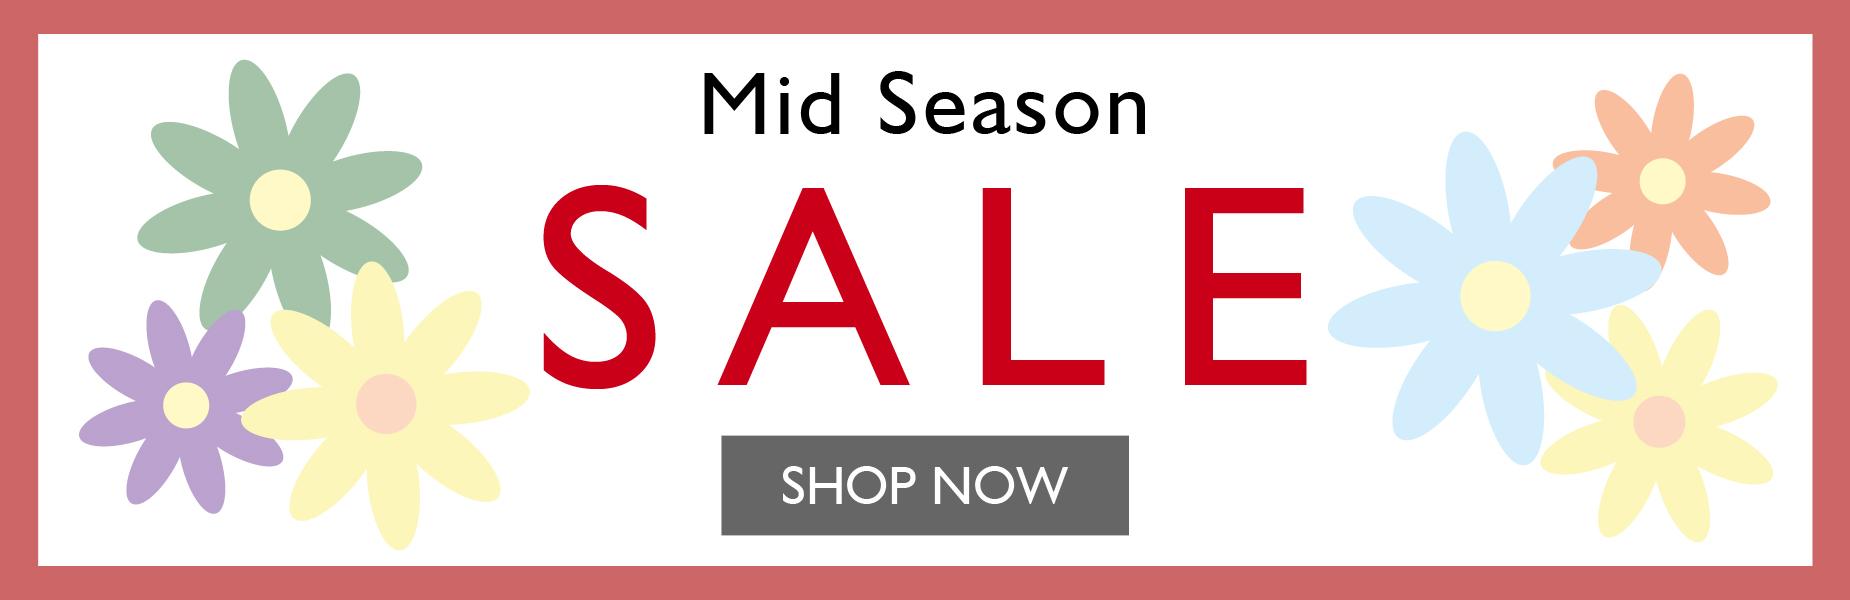 Mid Season Sale SS21 | Shop Now